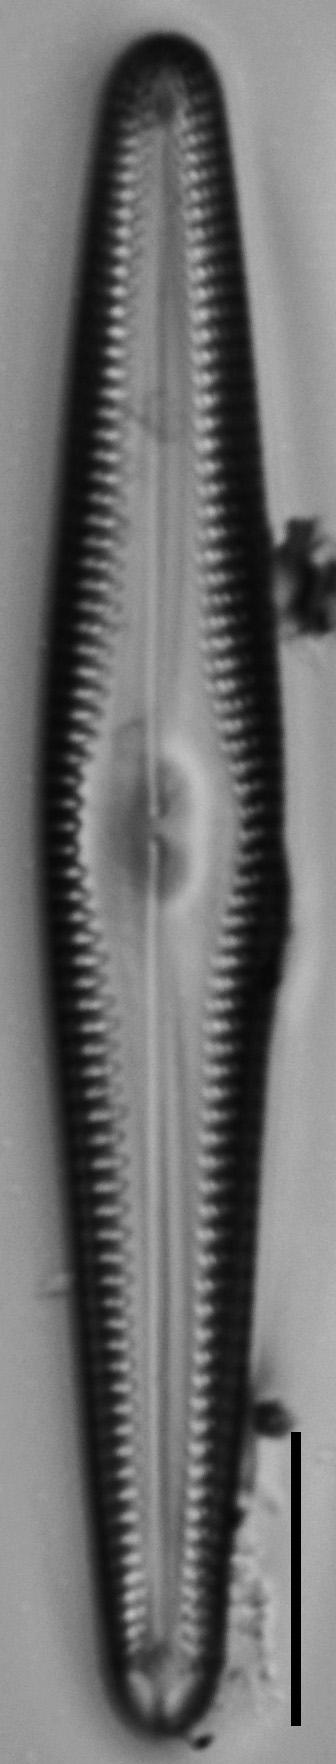 Gomphonema christenseni LM2